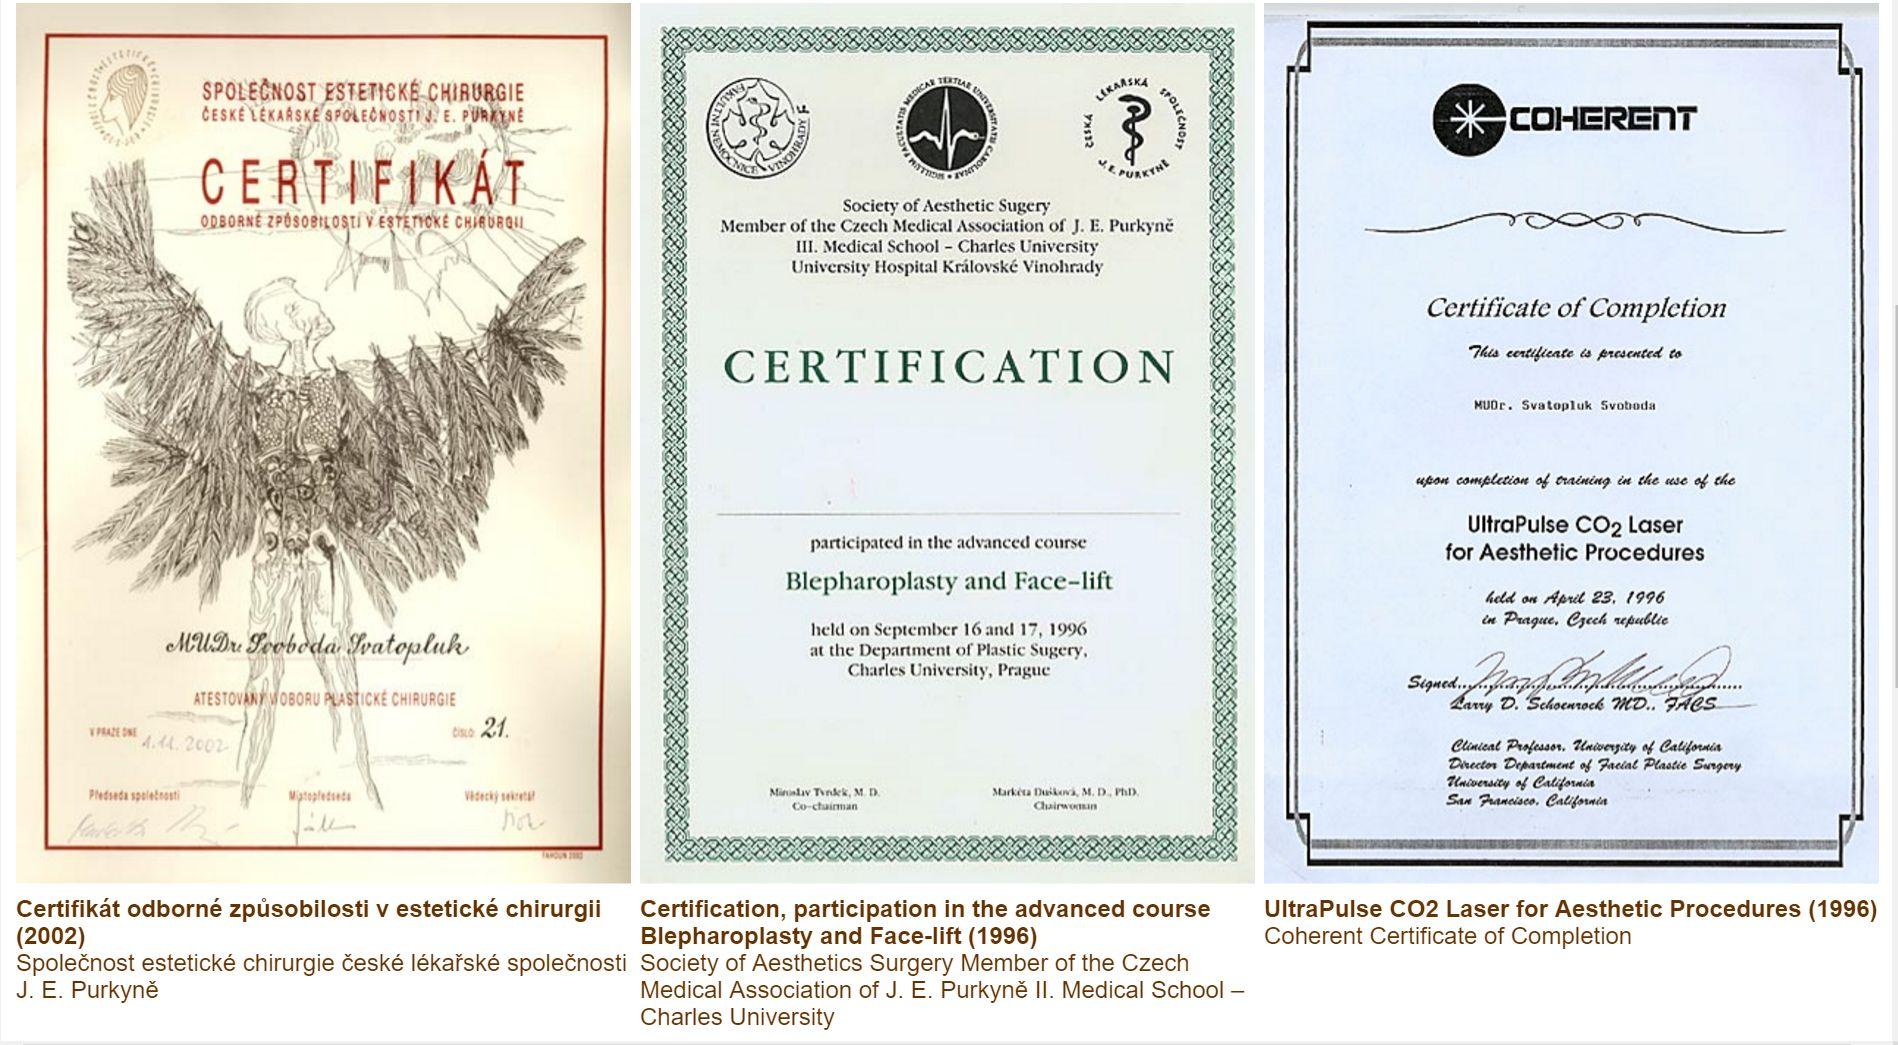 Certifikáty plastického chirurga MUDr. Svatopluka Svobody. Plastická chirurgie Praha